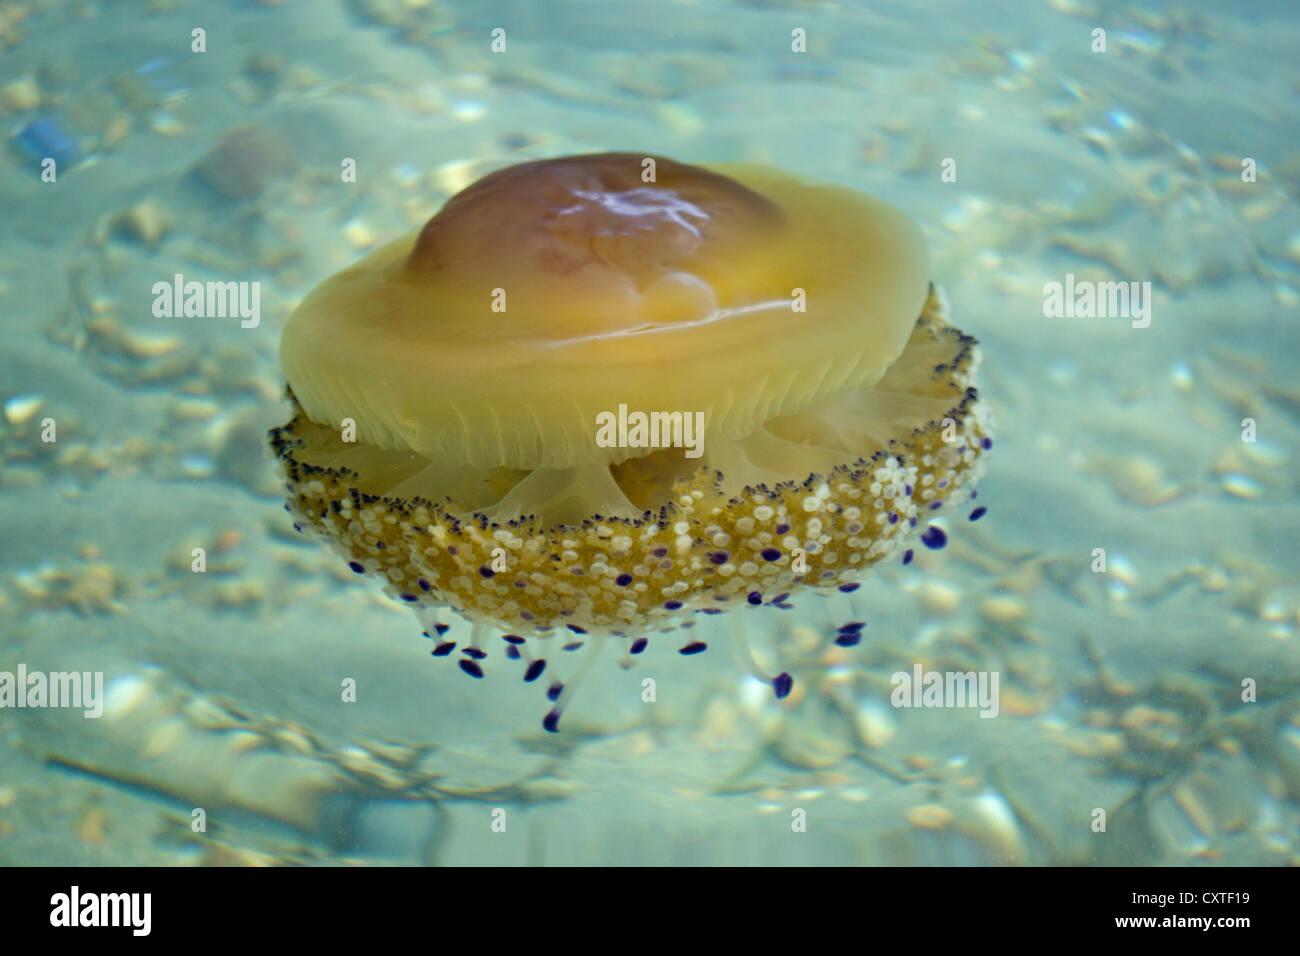 Single Mediterranean jellyfish in the Mar Menor, Costa Calida, South Eastern Spain, Europe - Stock Image